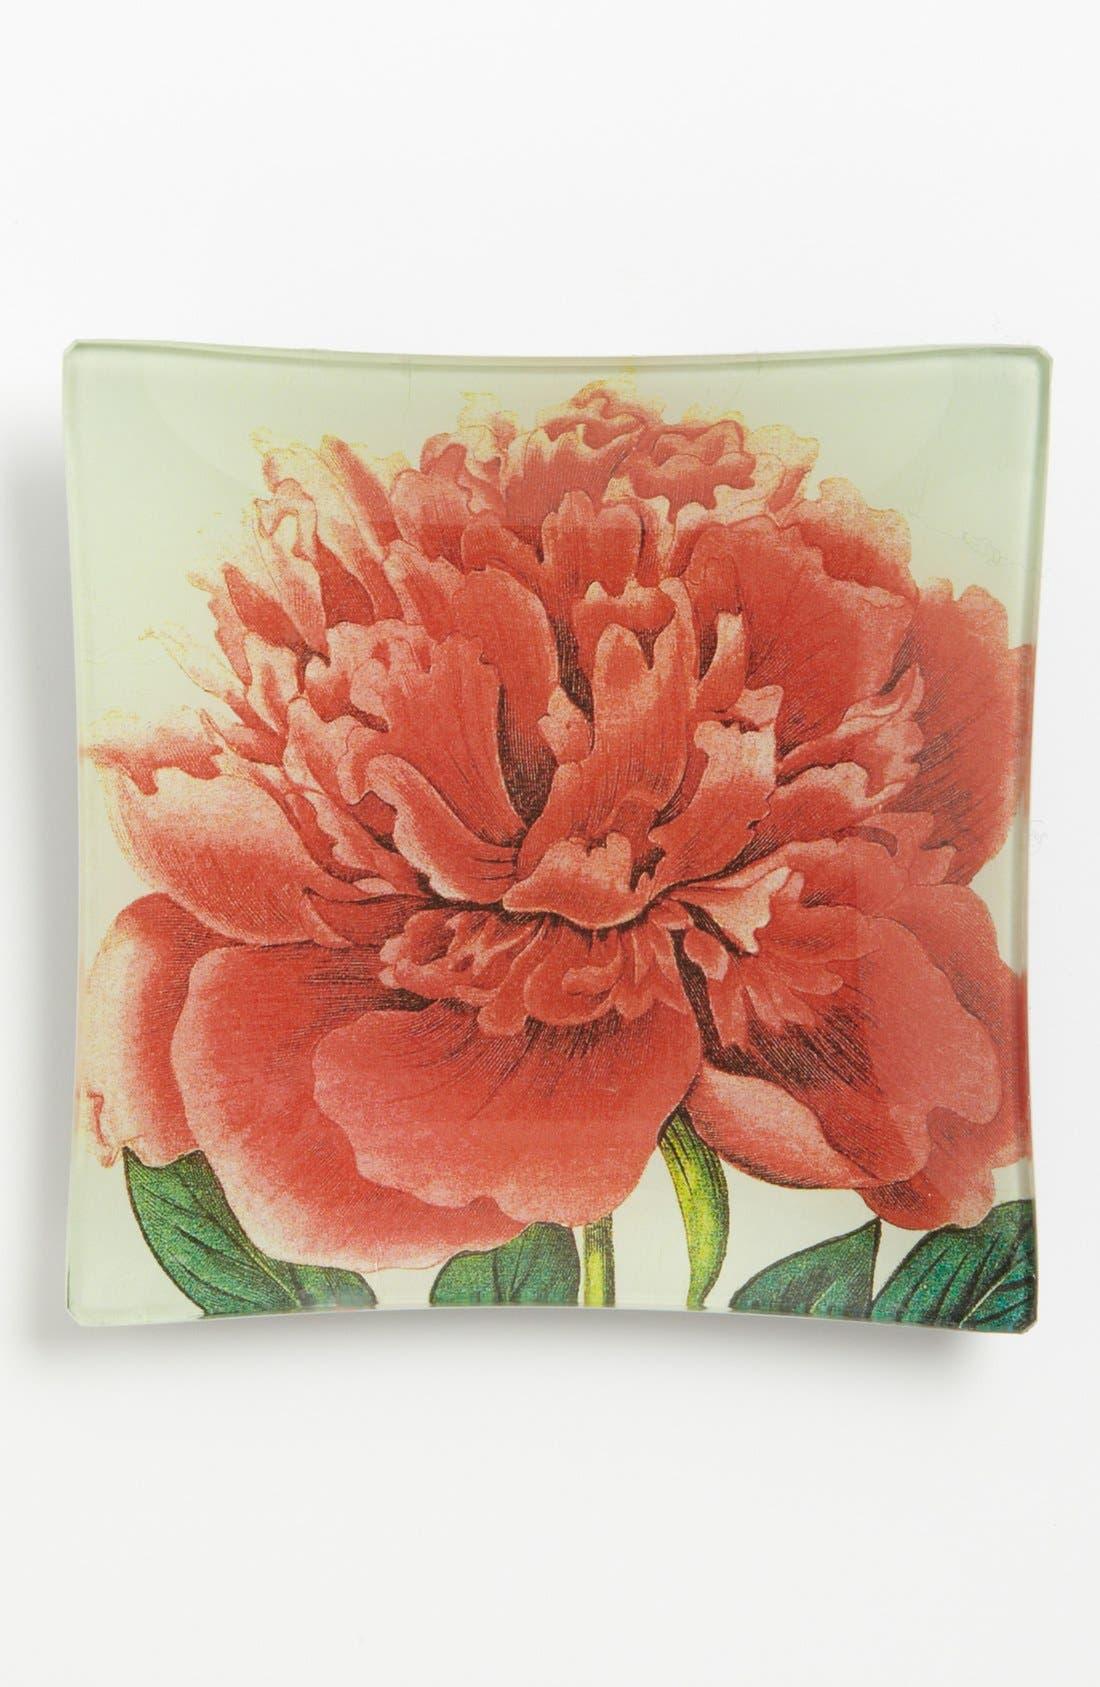 Alternate Image 1 Selected - Ben's Garden 'Pink Peony' Trinket Tray